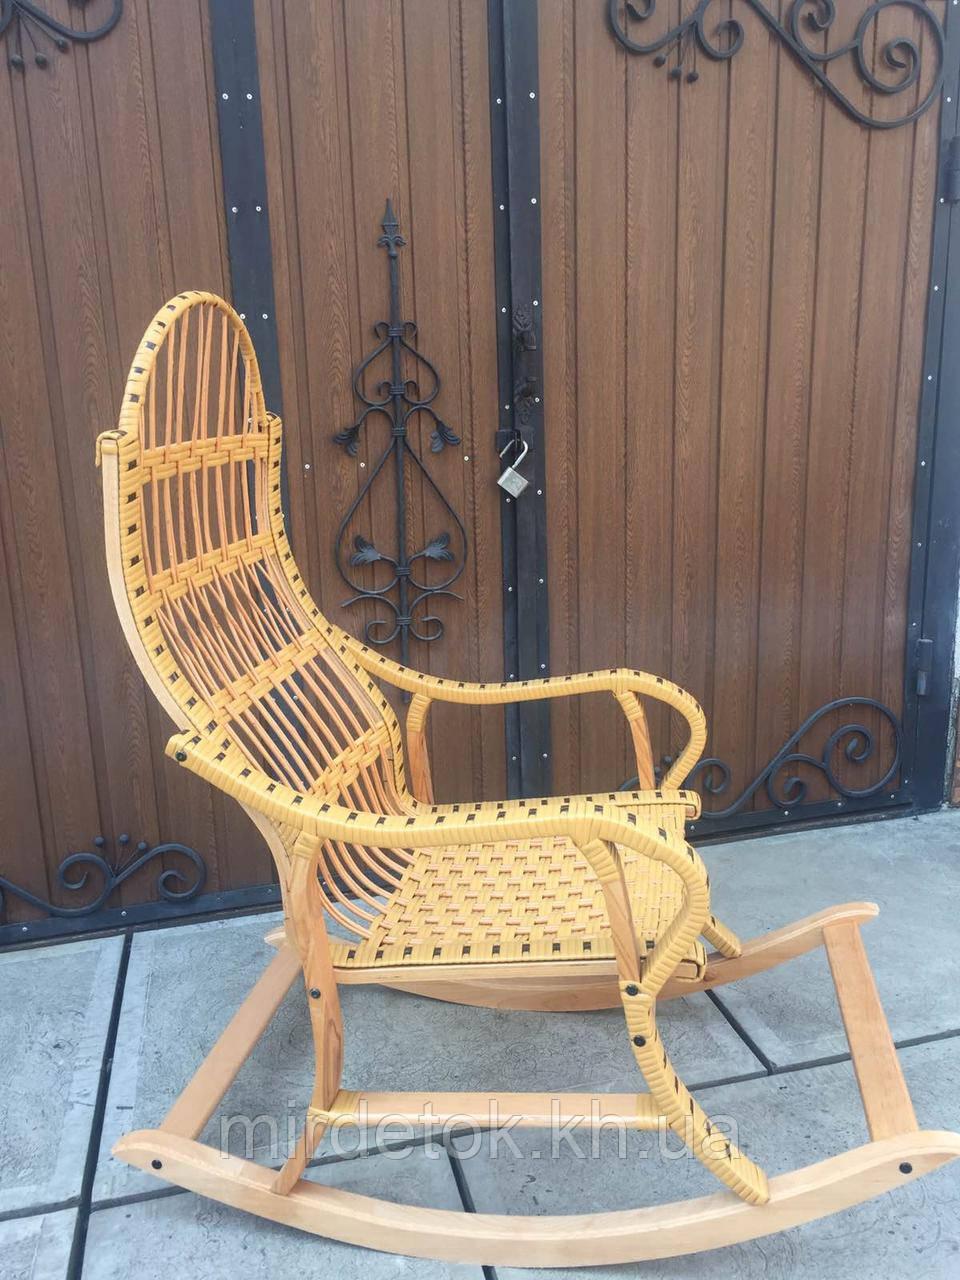 Кресло-качалка  Принцесса-Беж Ротанговая разборная на буковом каркасе до 150 кг